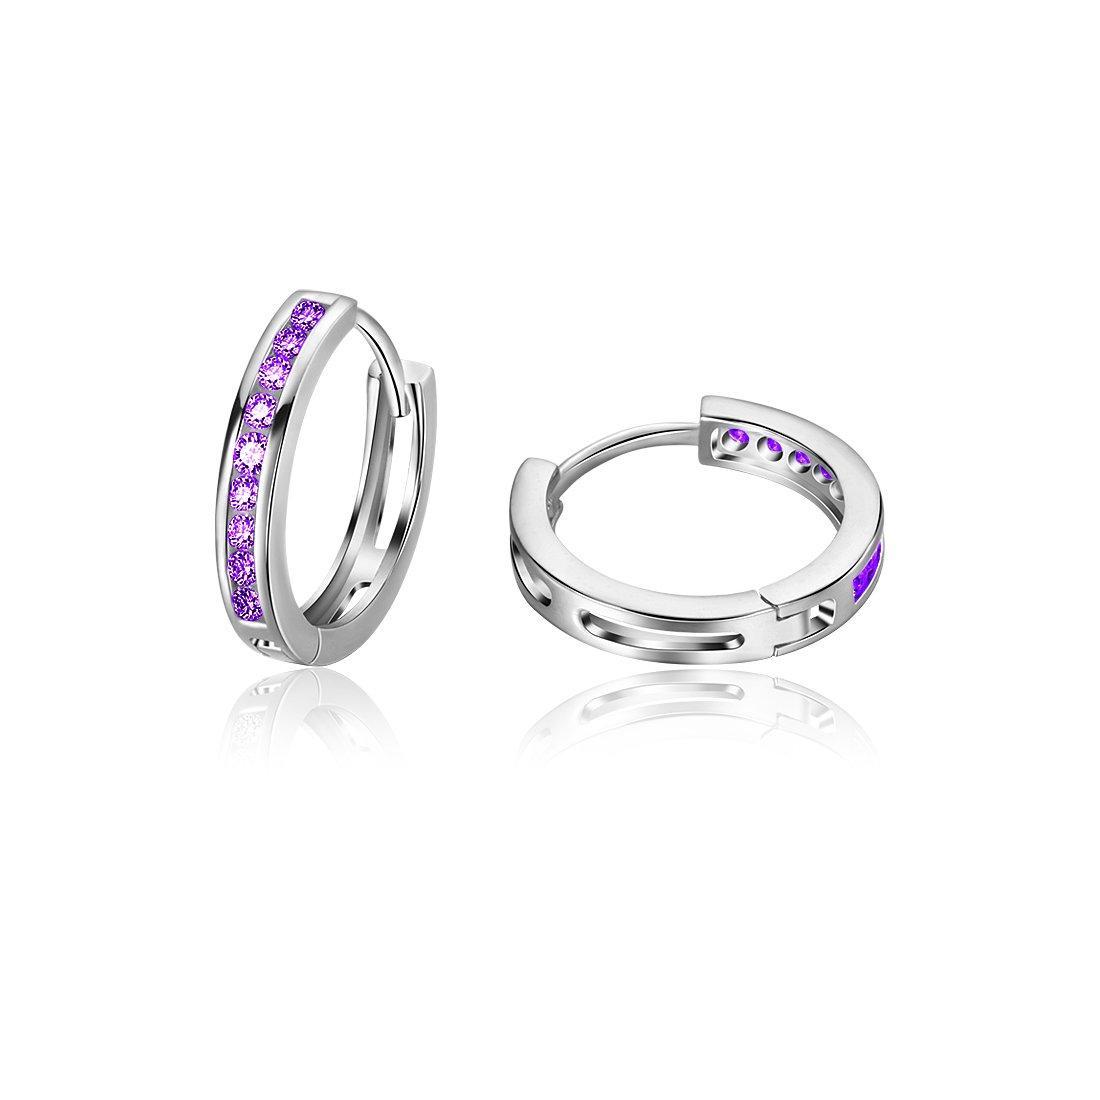 Carleen 925 Sterling Silver Channel Setting Round Cut 9-stone Cubic Zirconia CZ Hinged Hoop Earrings for Women Girls Diameter 1.8cm (Purple)